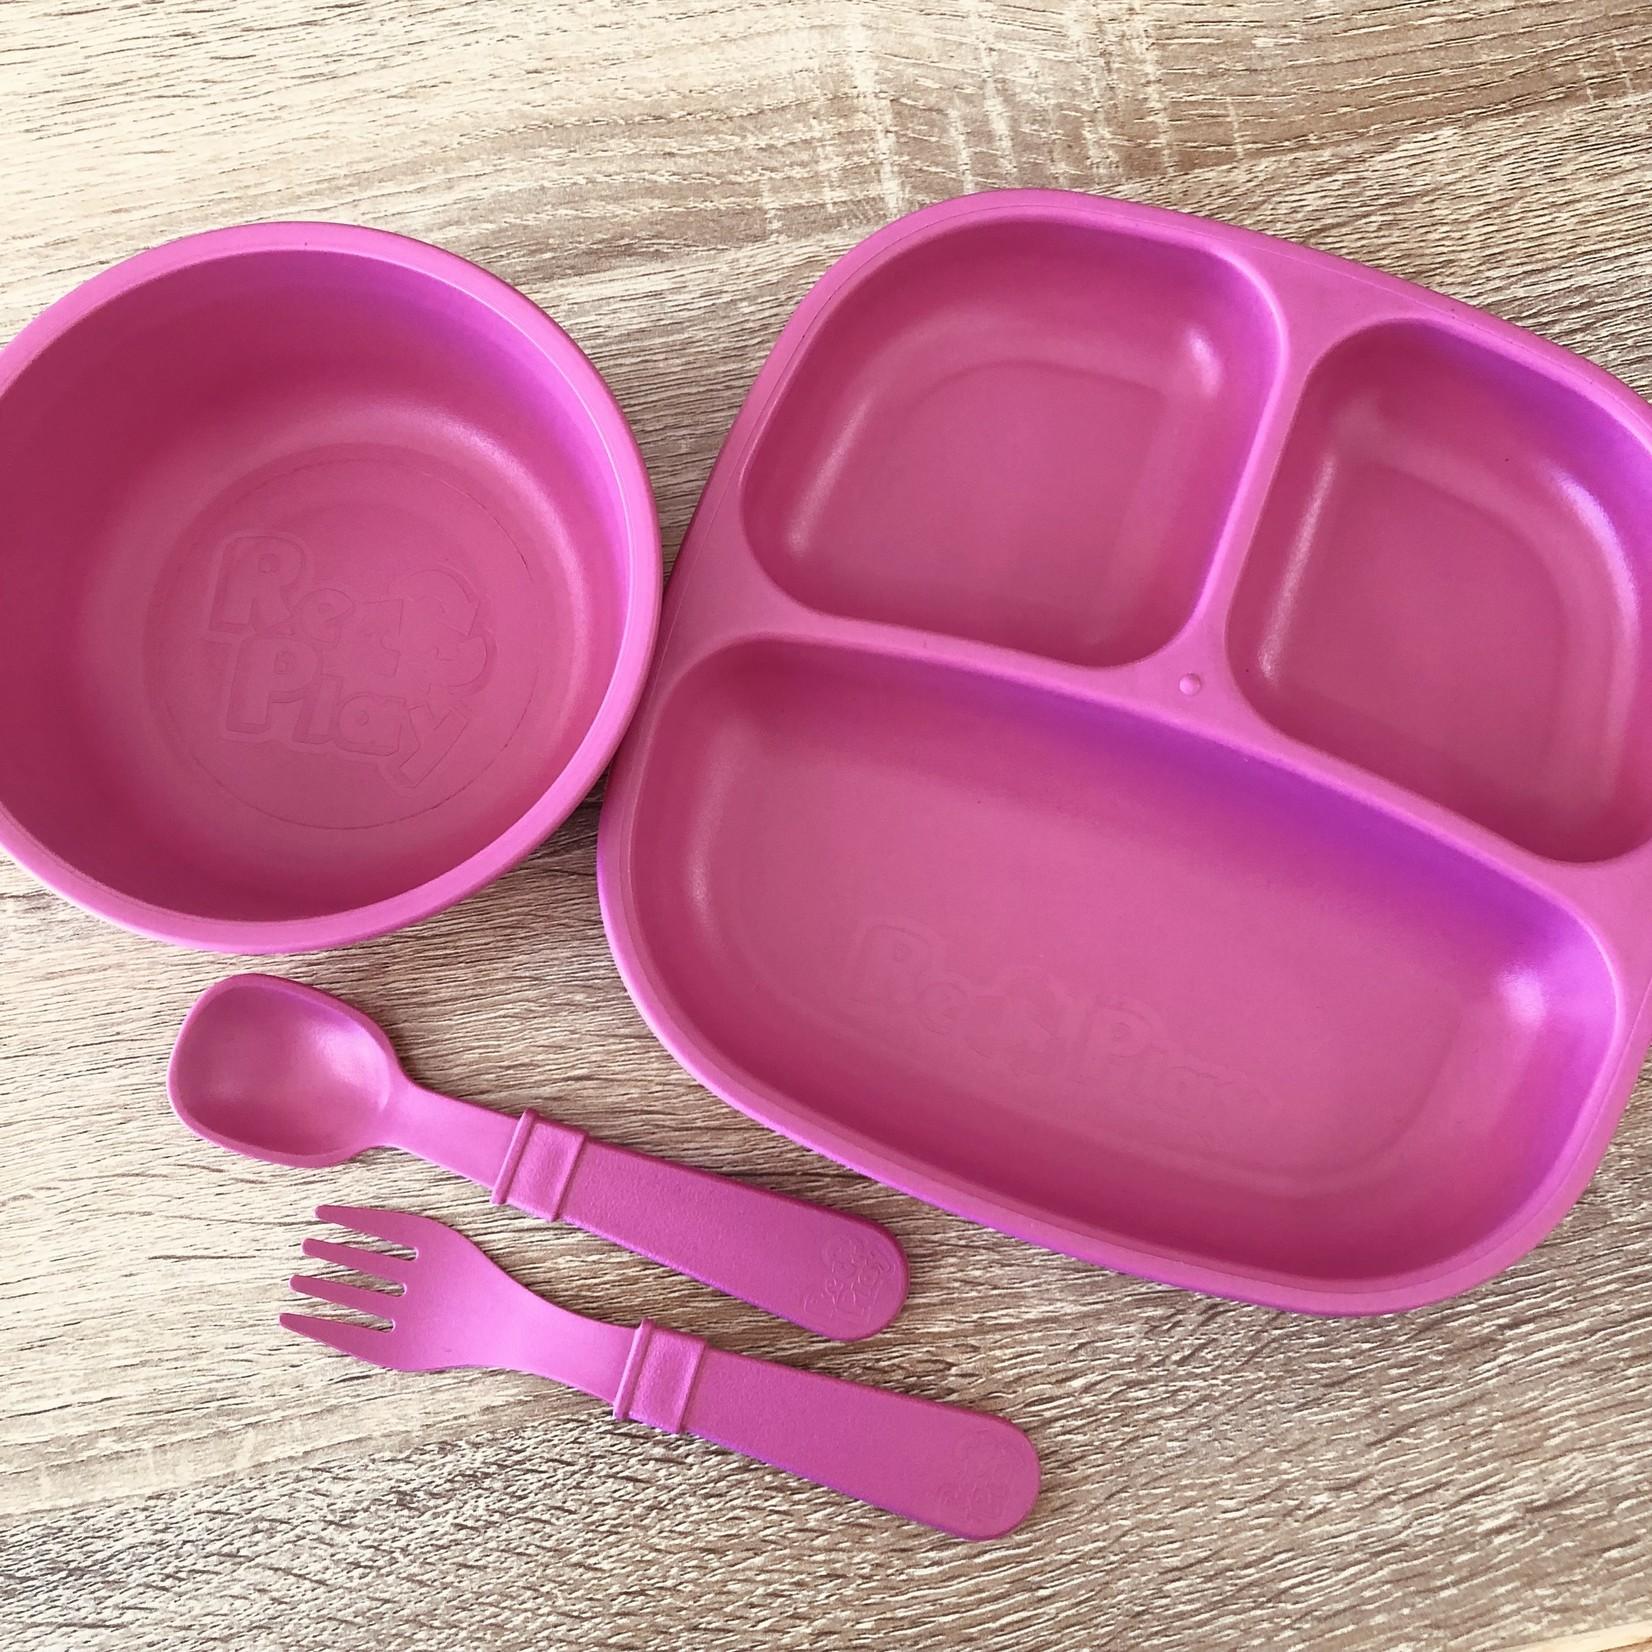 Replay Replay Dinner Set - Bright Pink